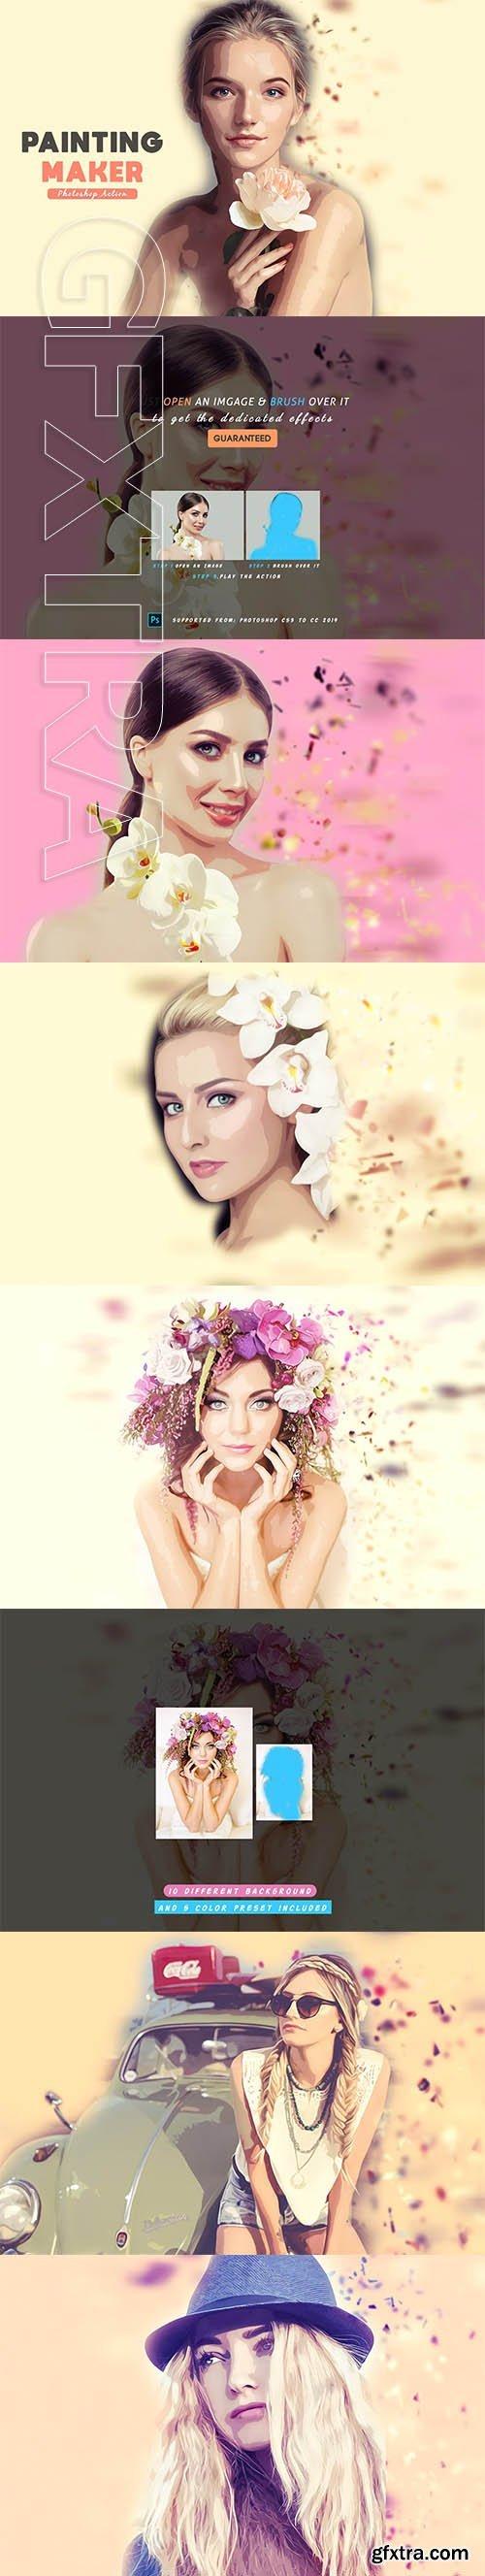 CreativeMarket - Painting Maker Photoshop Action 3999758